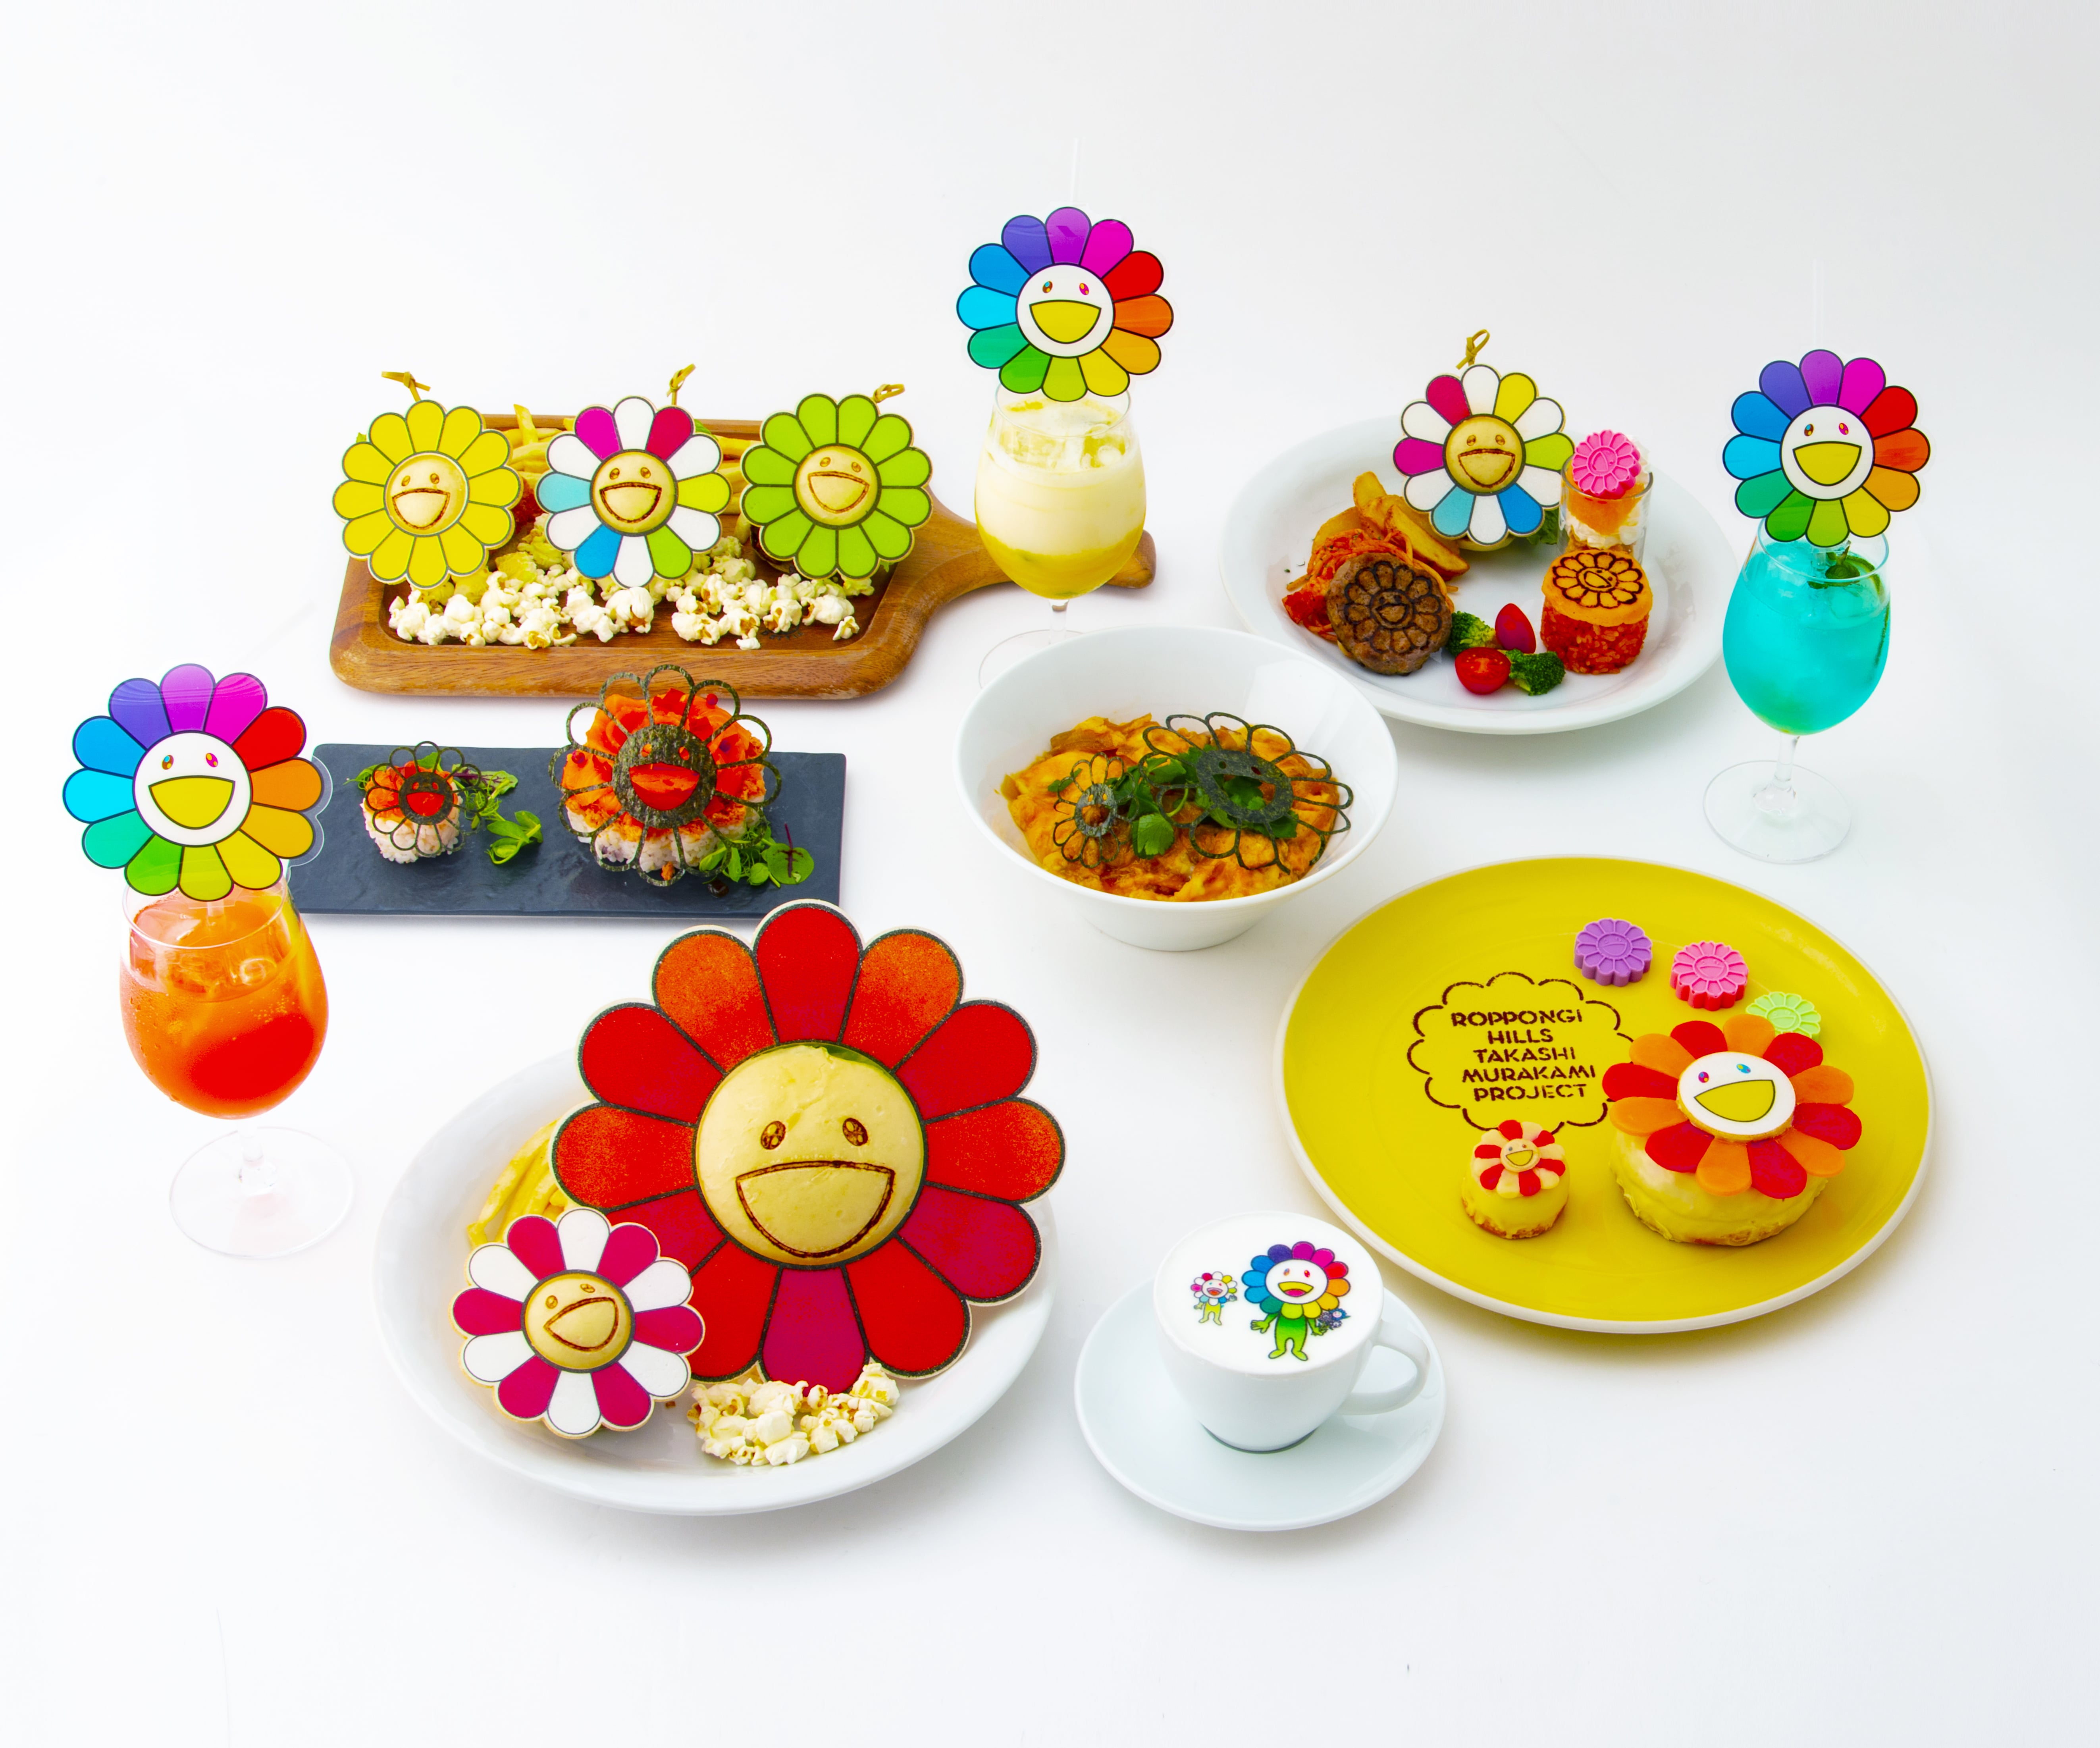 Takashi Murakami Flower Parent and Child Cafe 2021